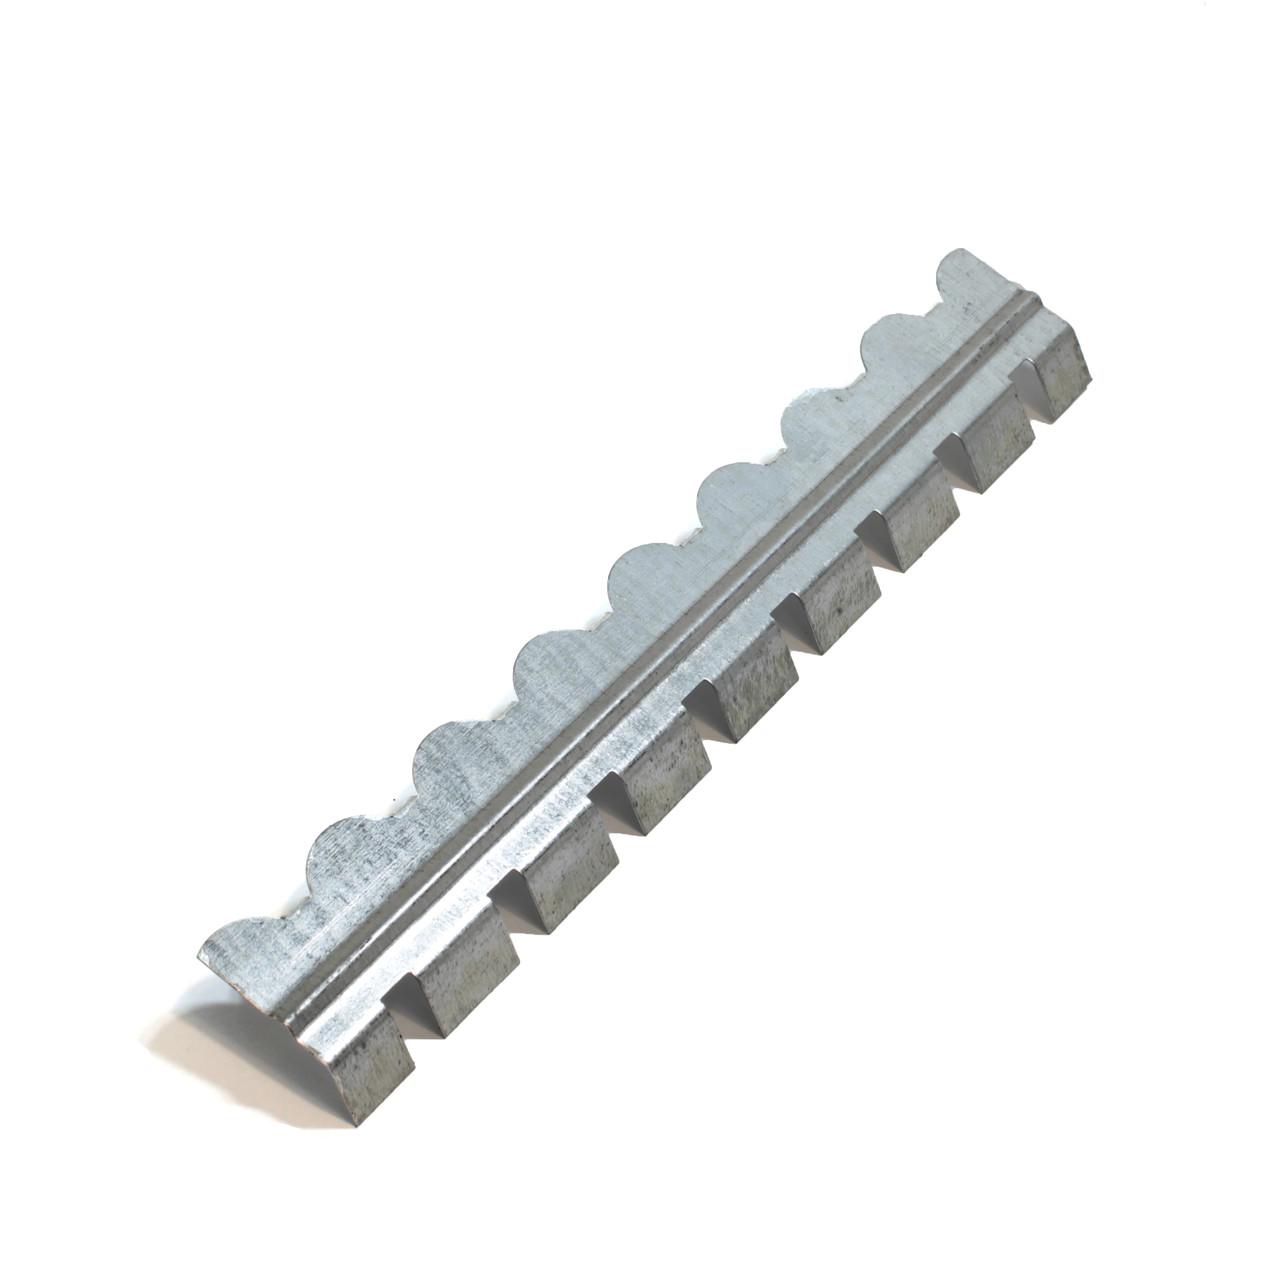 Гребенка решета Нива УВР 0,7х300 44Б-2-12-3-2